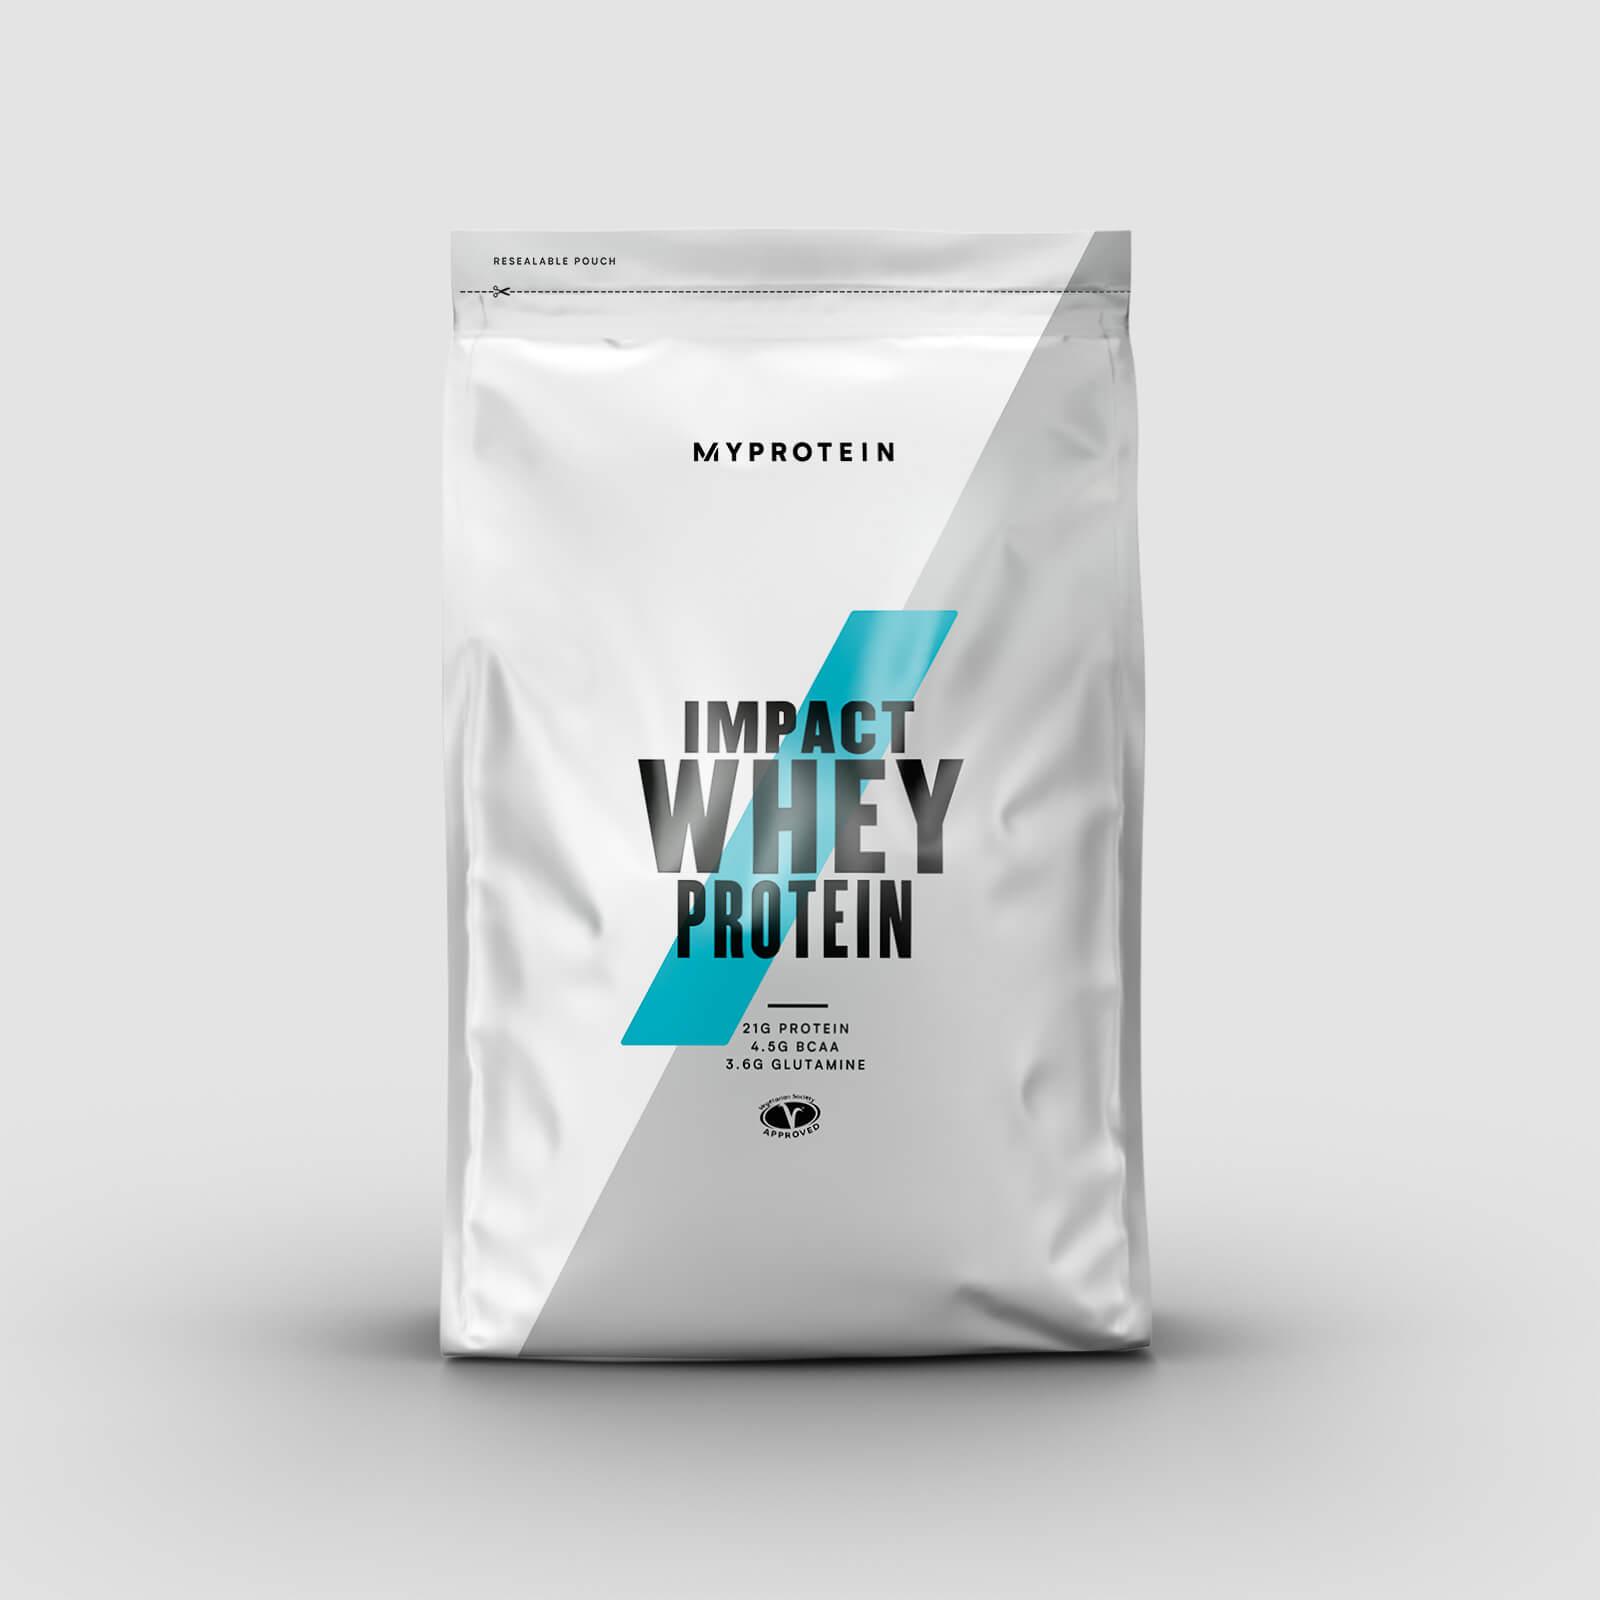 Impact Whey Protein. - 11lb - Vanilla